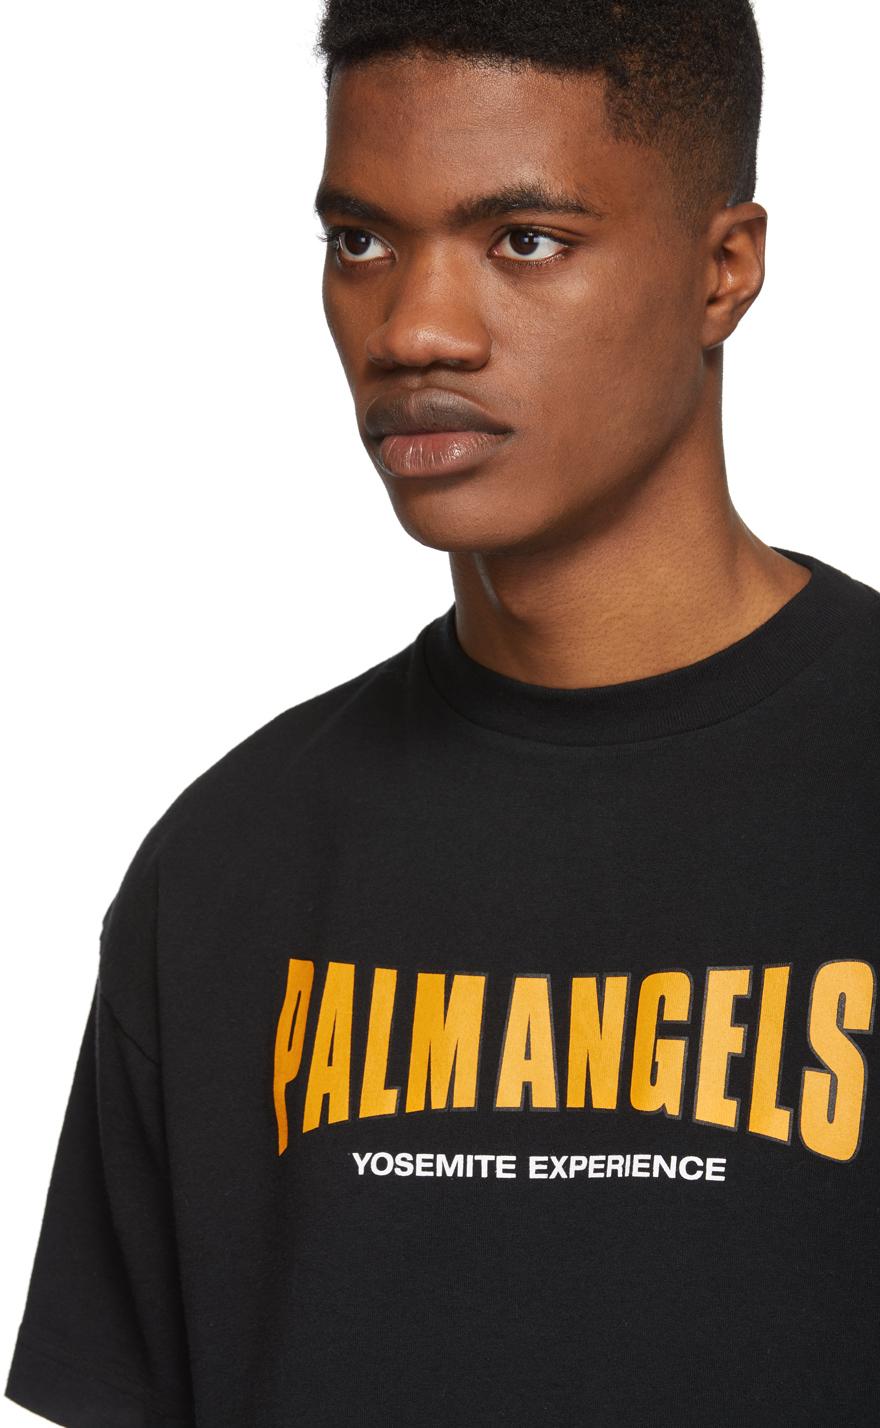 Palm Angels T-shirts Black 'Yosemite Experience' T-Shirt